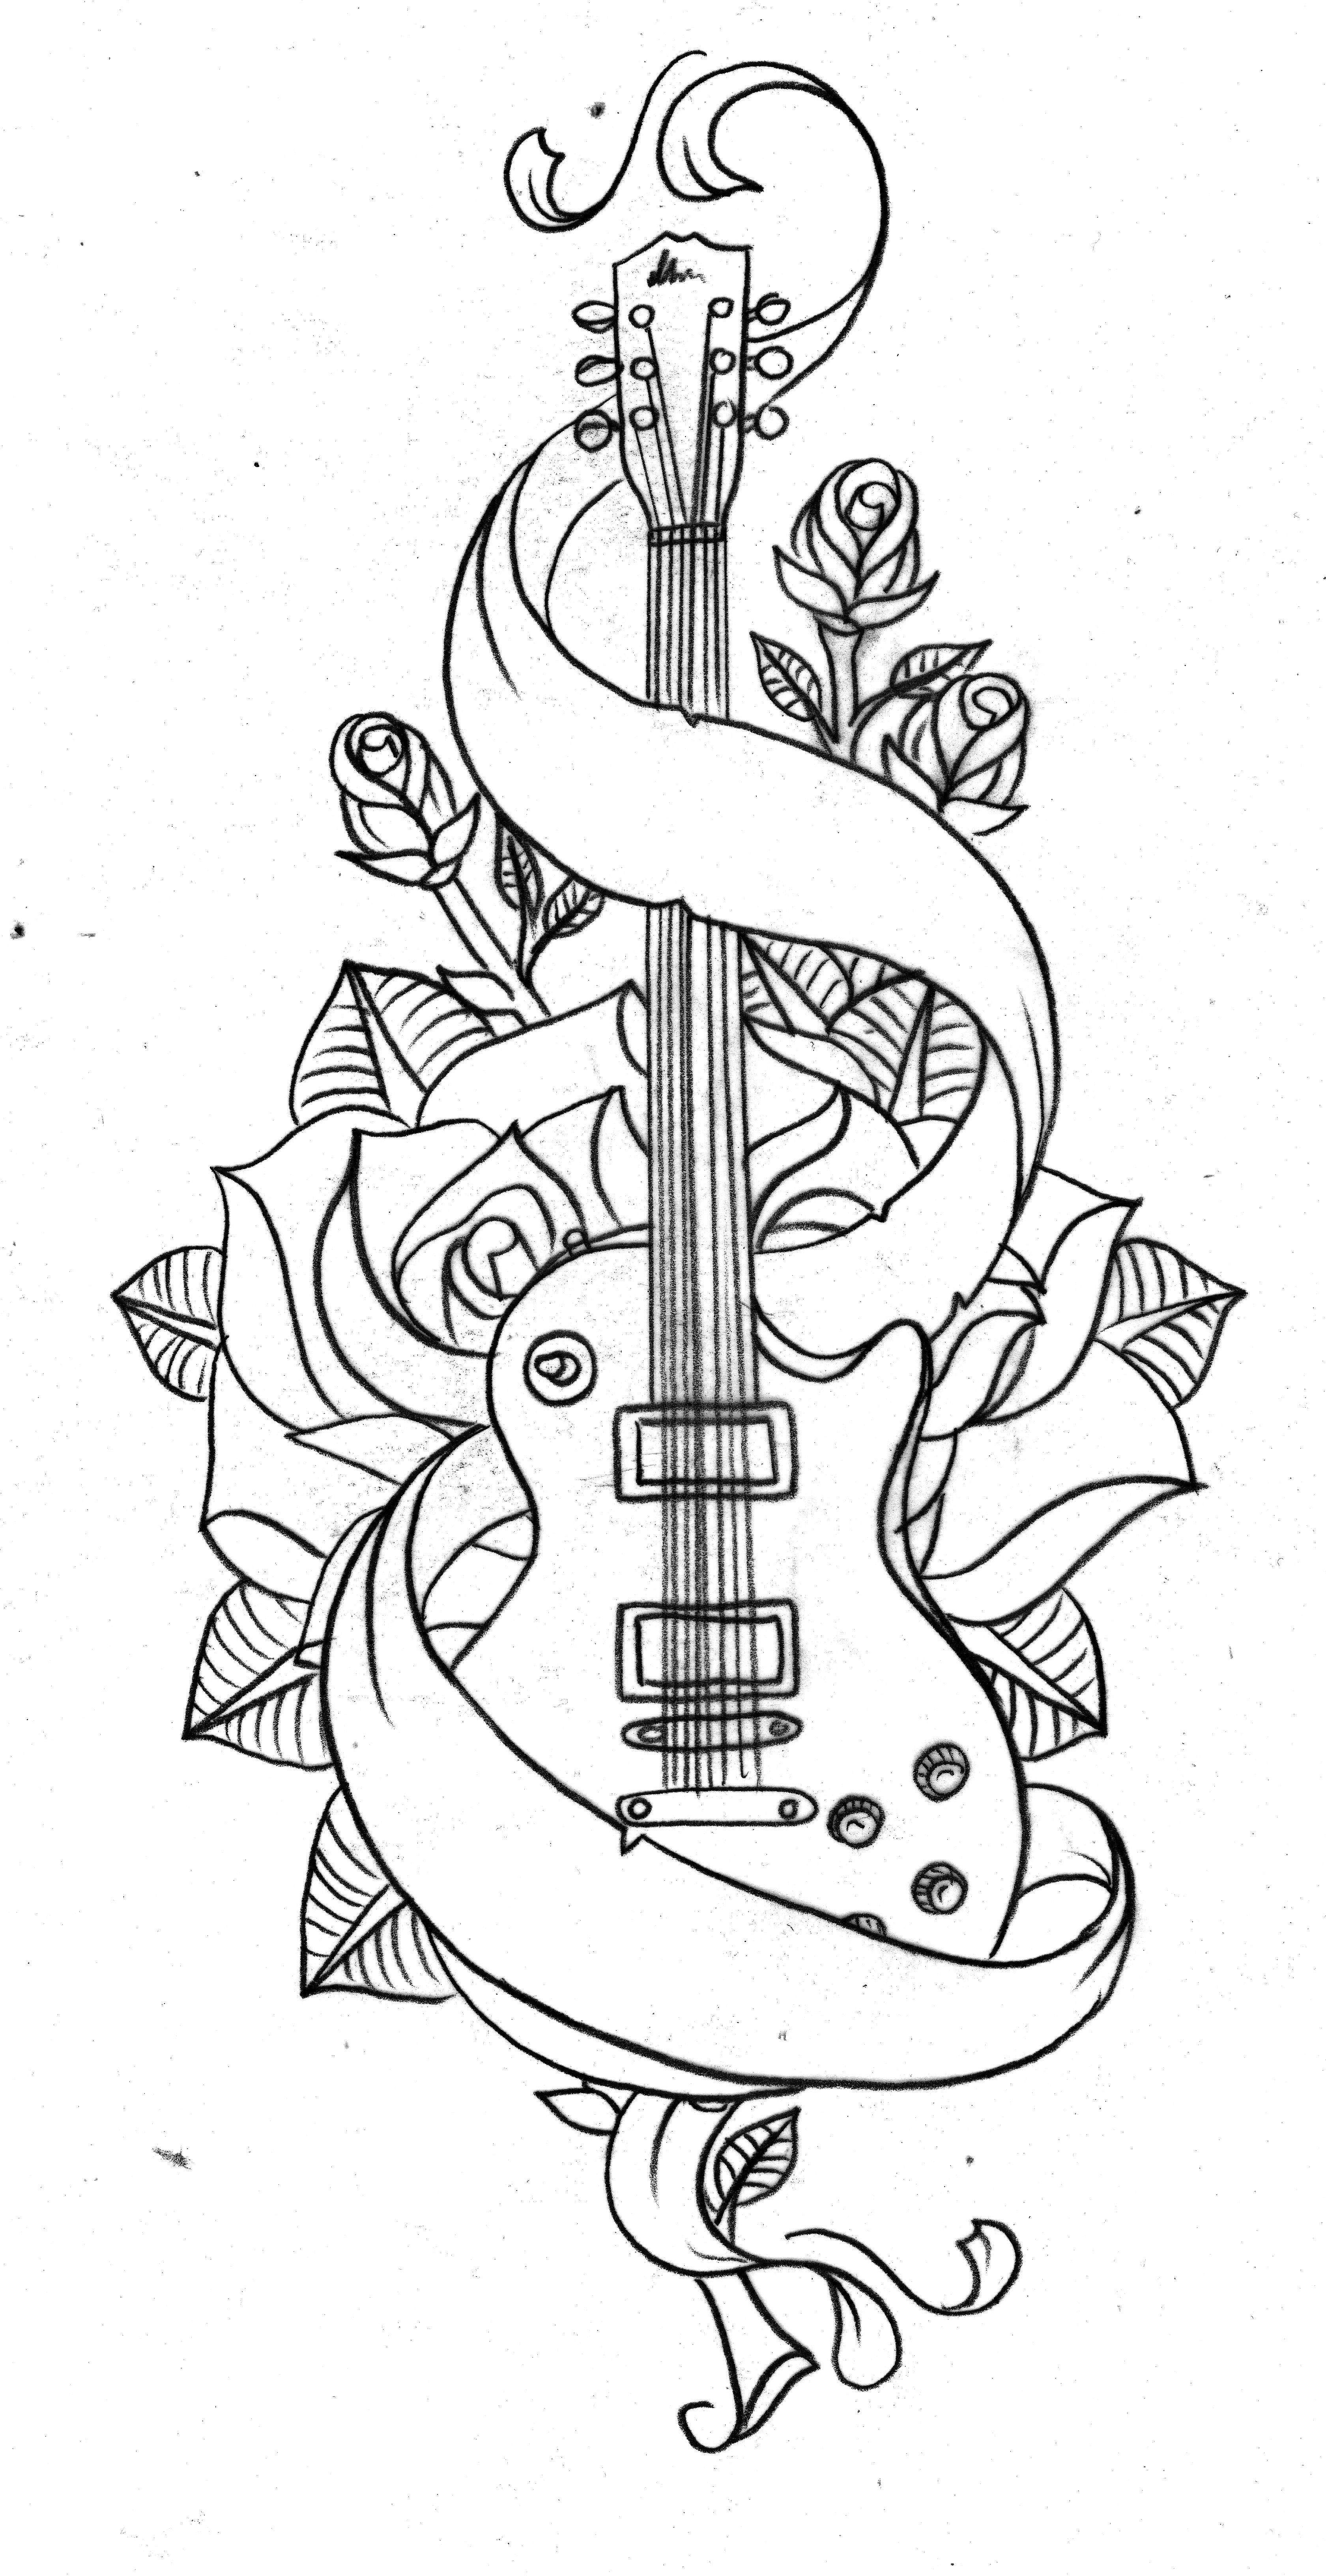 old_school_guitar_by_nevermore_ink-d4jodra.jpg (3361×6529)